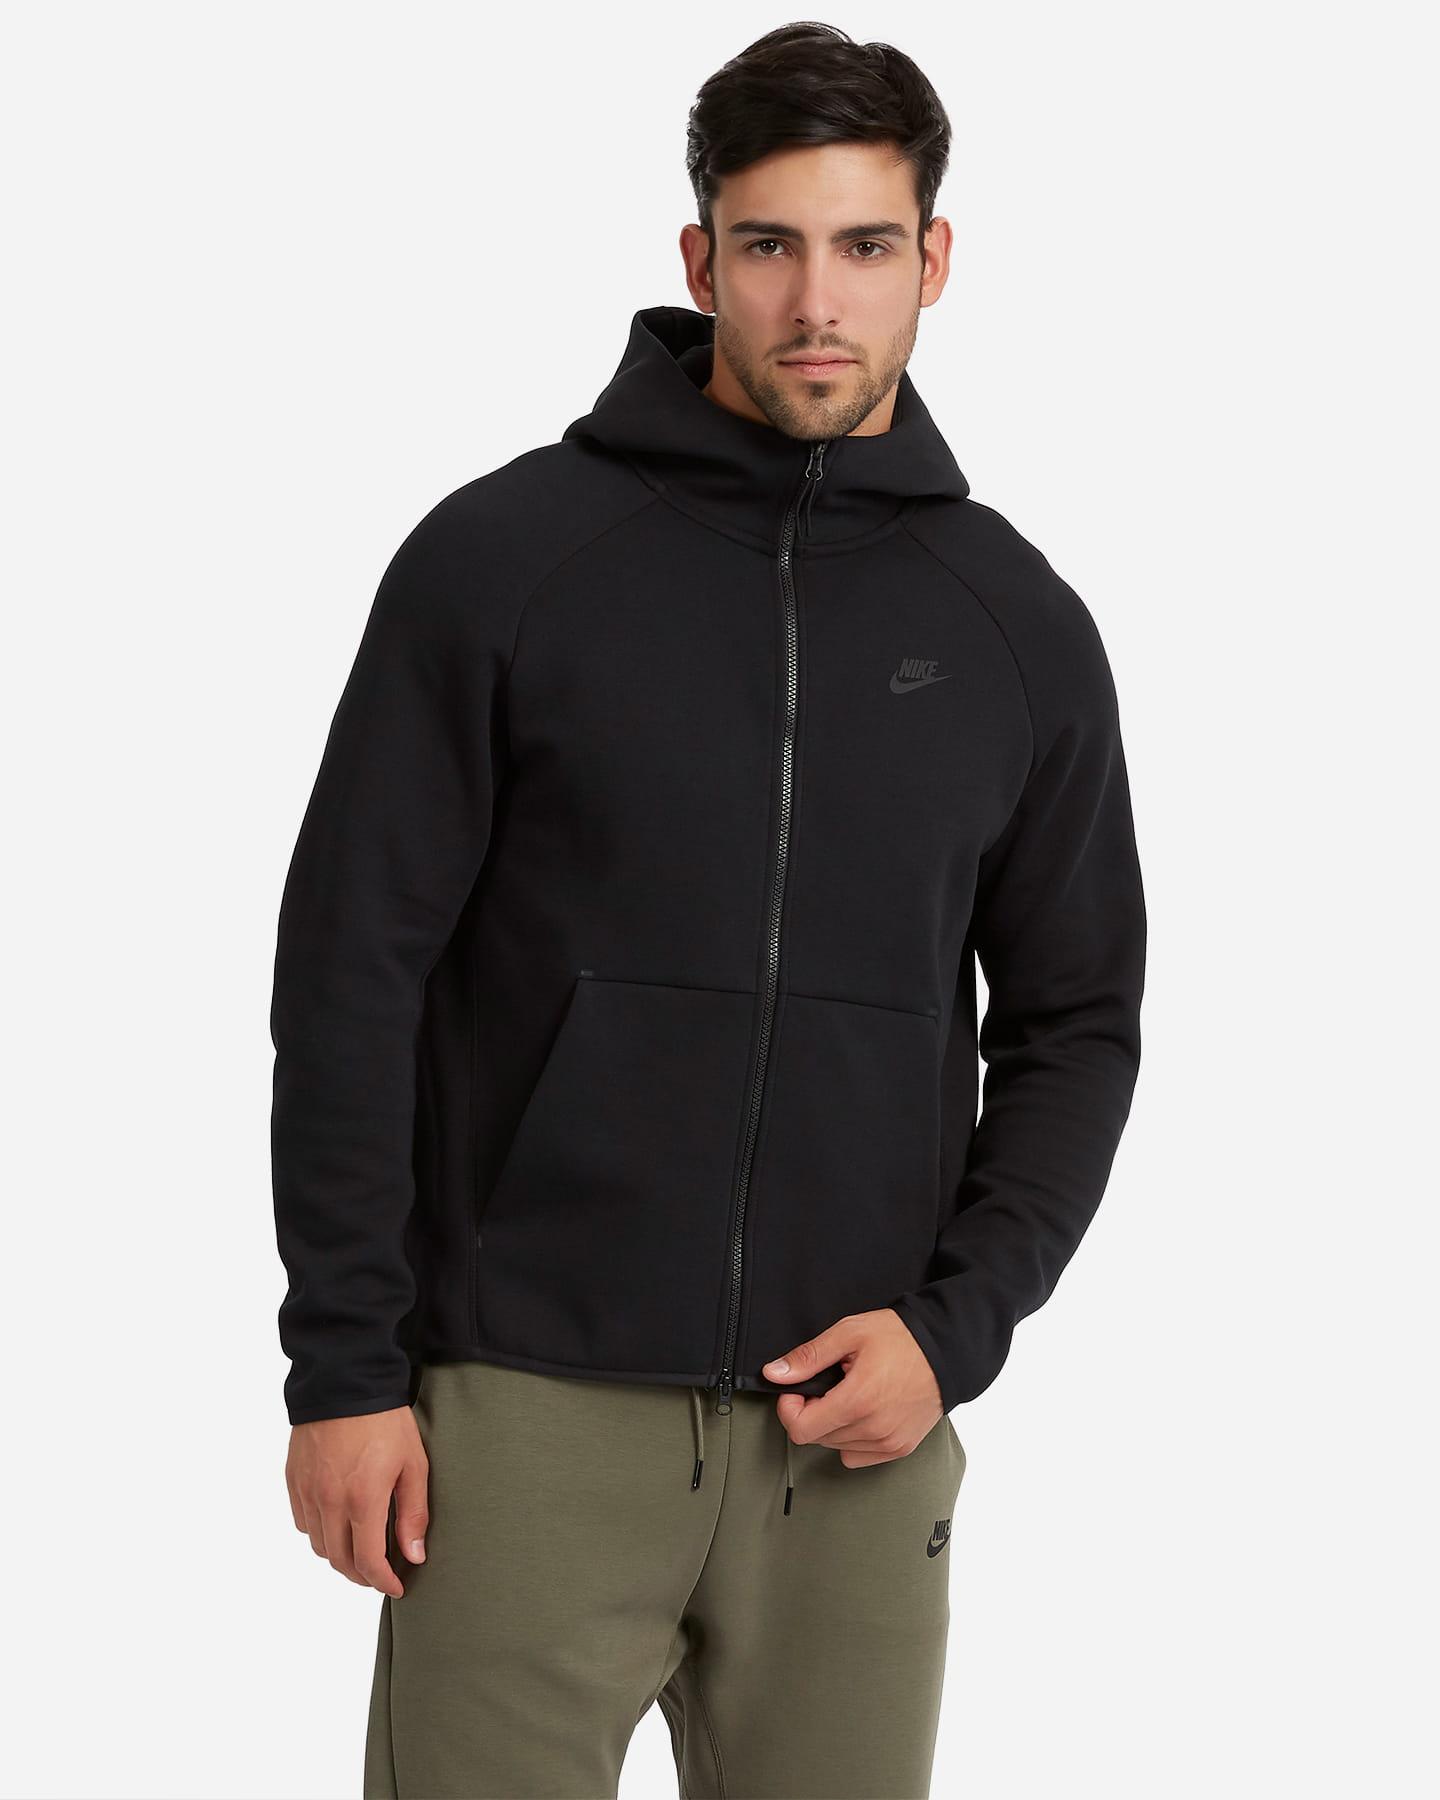 Bluza męska Nike Sportswear Tech Fleece czarna (928483 010)